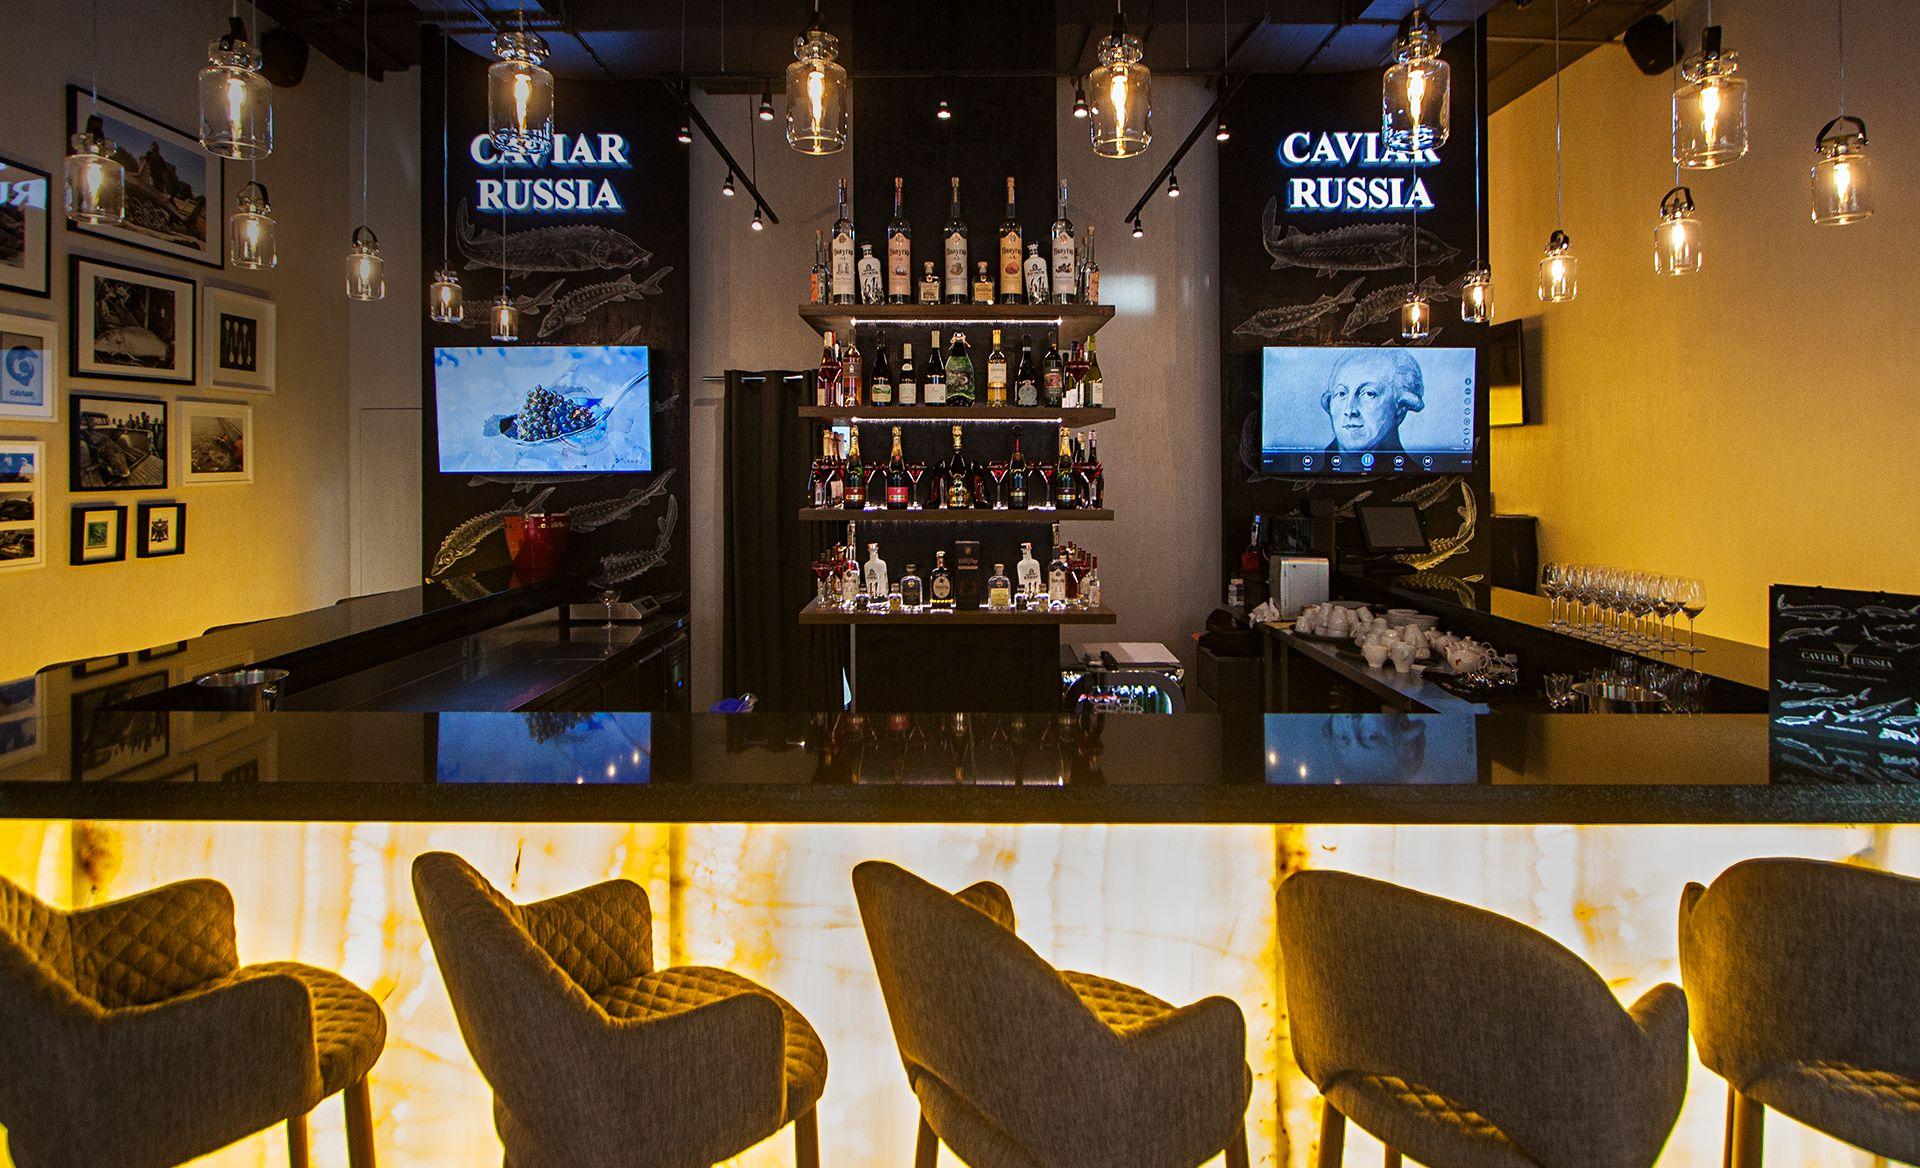 Фотография: Ресторан Caviar Russia